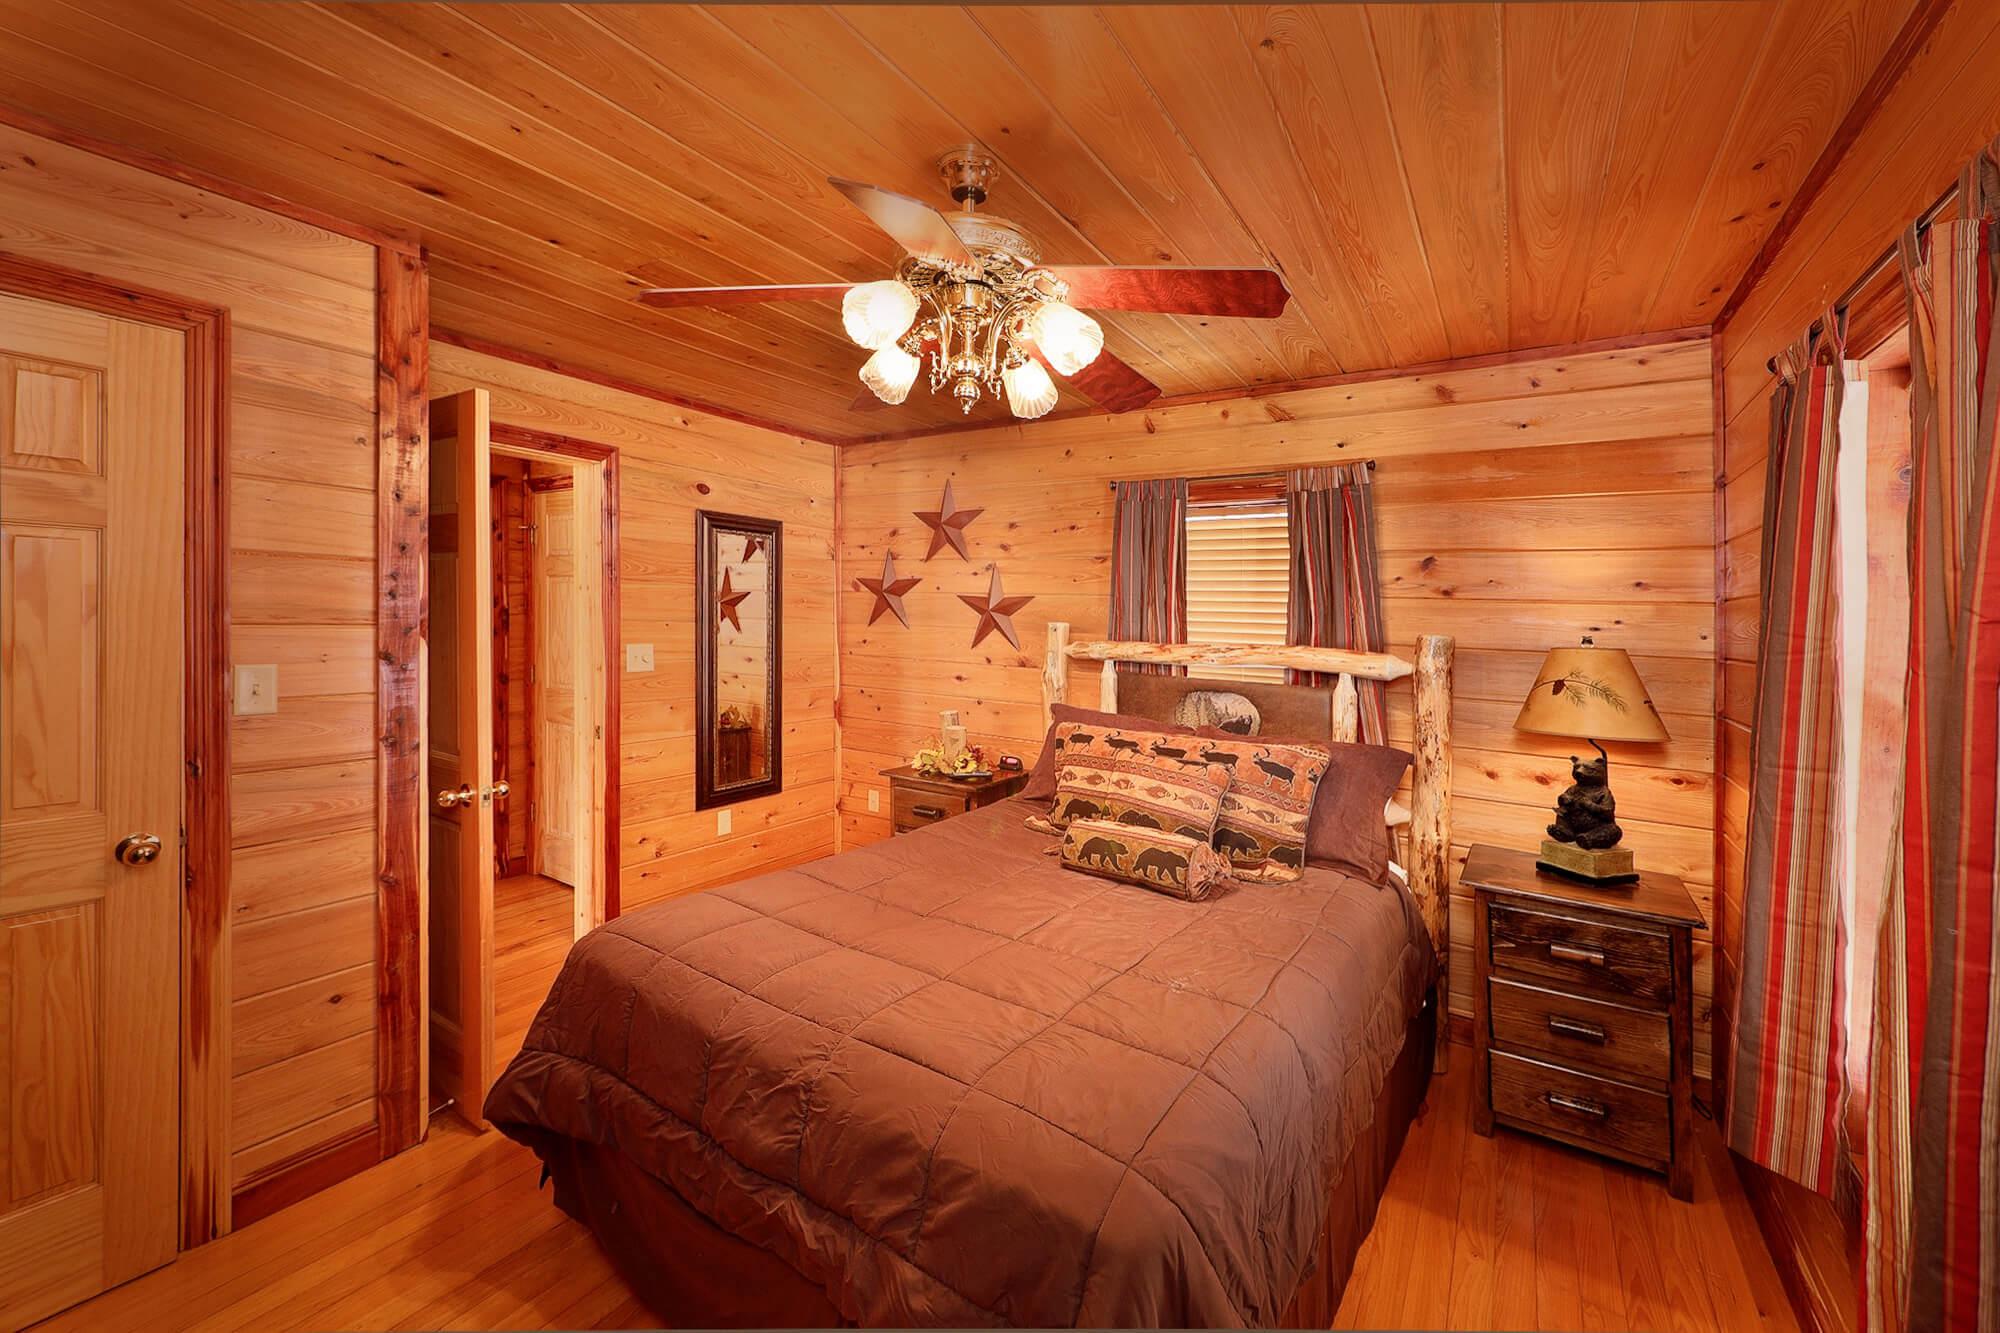 smoky mountain romance 1 bedroom secluded private cabin rental elk springs resort. Black Bedroom Furniture Sets. Home Design Ideas